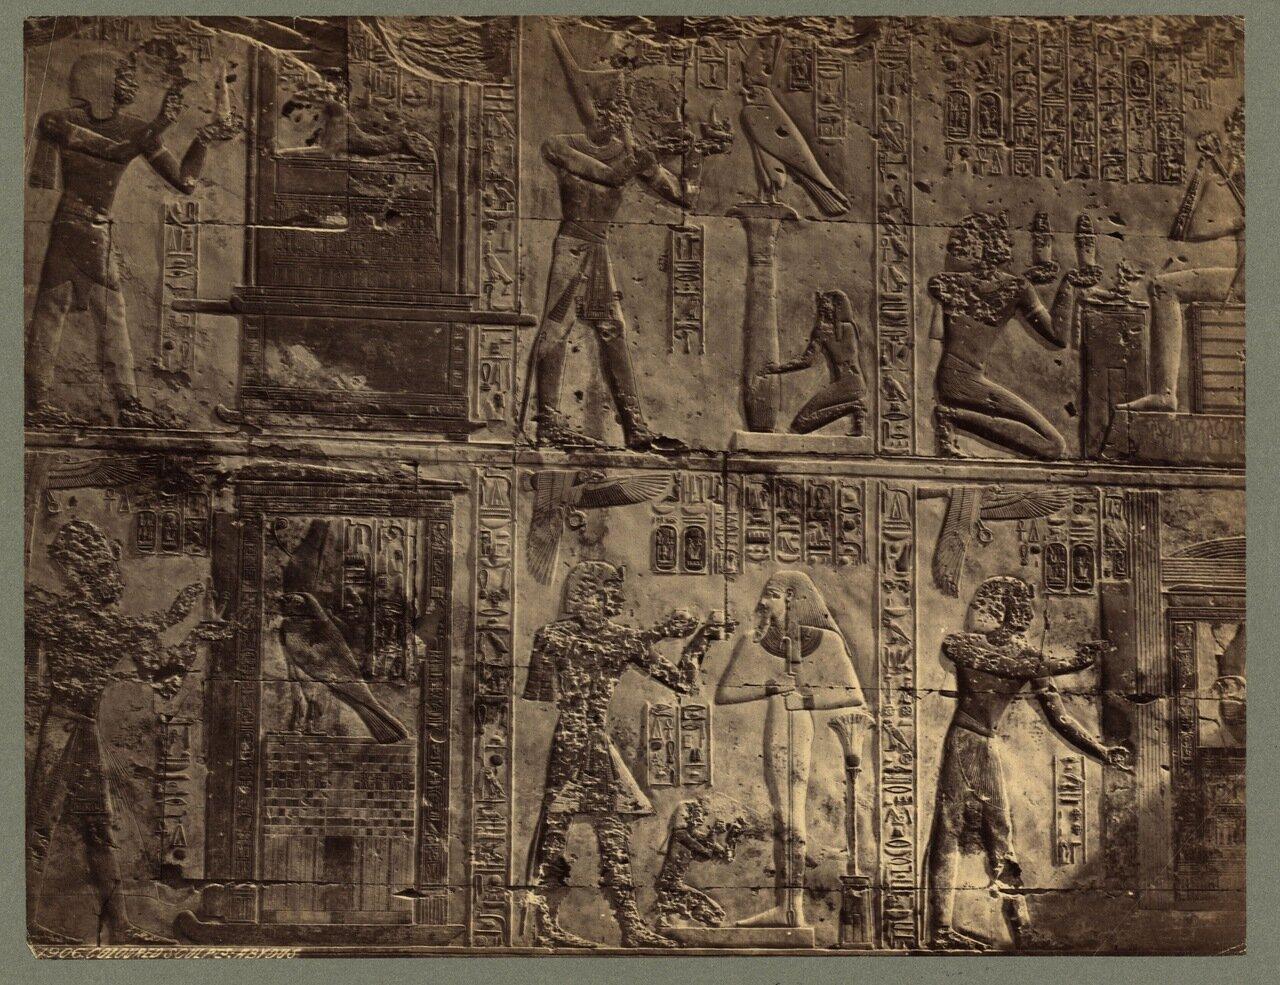 Абидос. Рельеф в храме Сети I